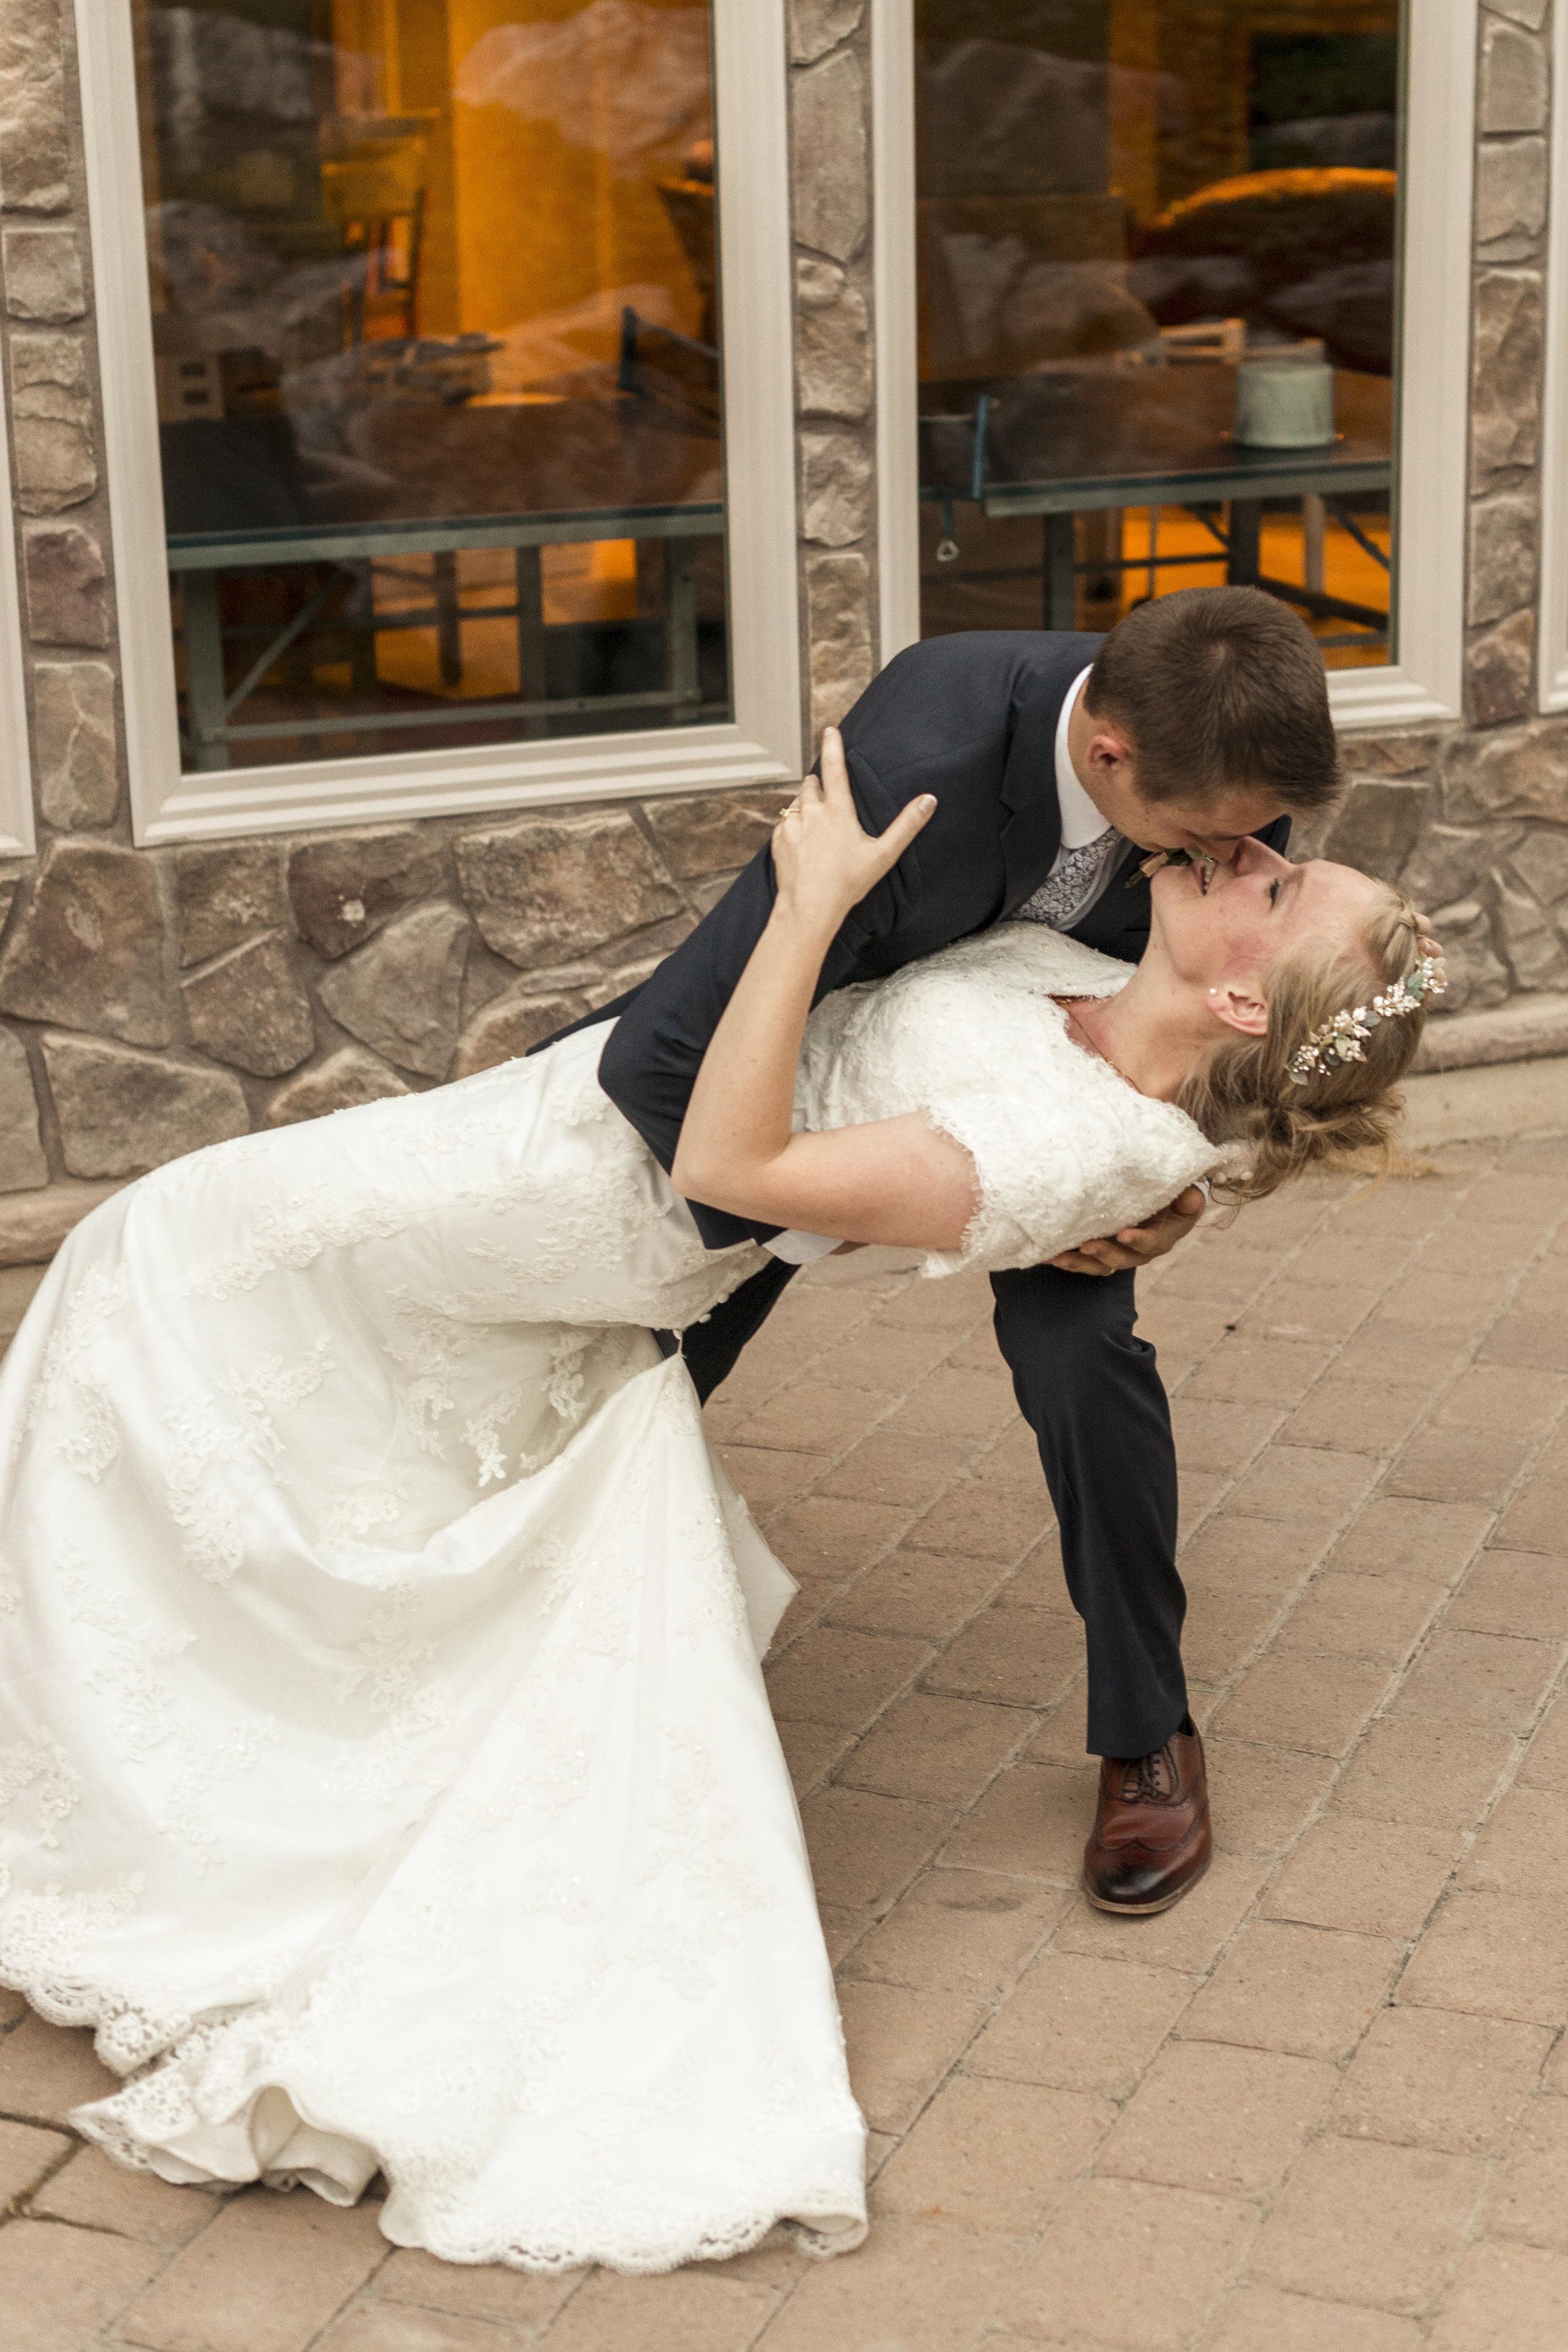 LDS Summer Wedding | South Jordan, Utah Wedding Photographer| Bri Bergman Photography 33.JPG